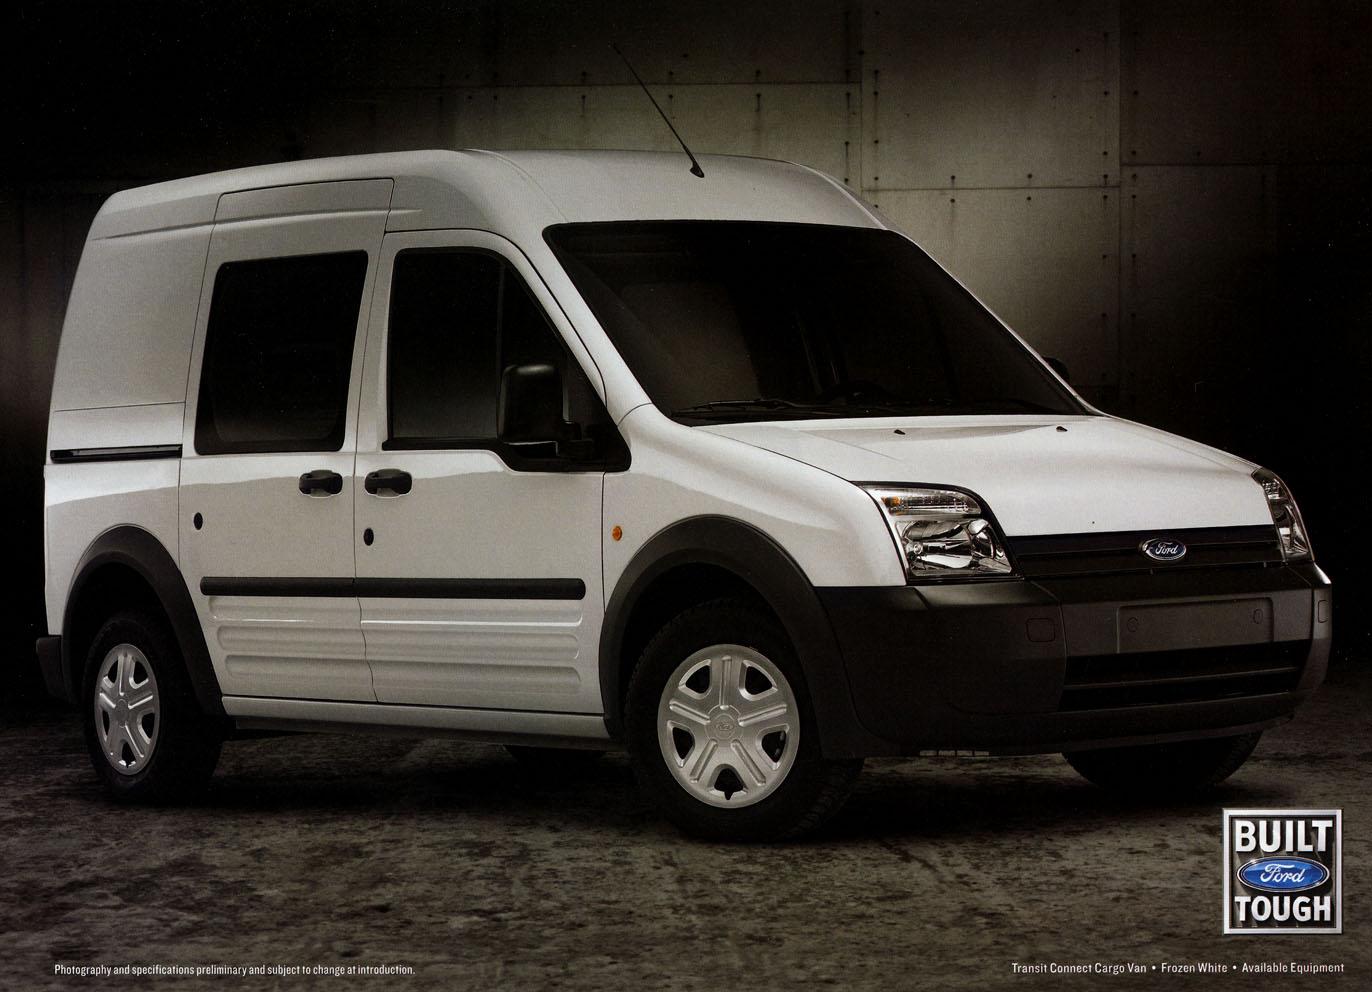 Ford Trucks Cars >> Hot Cars